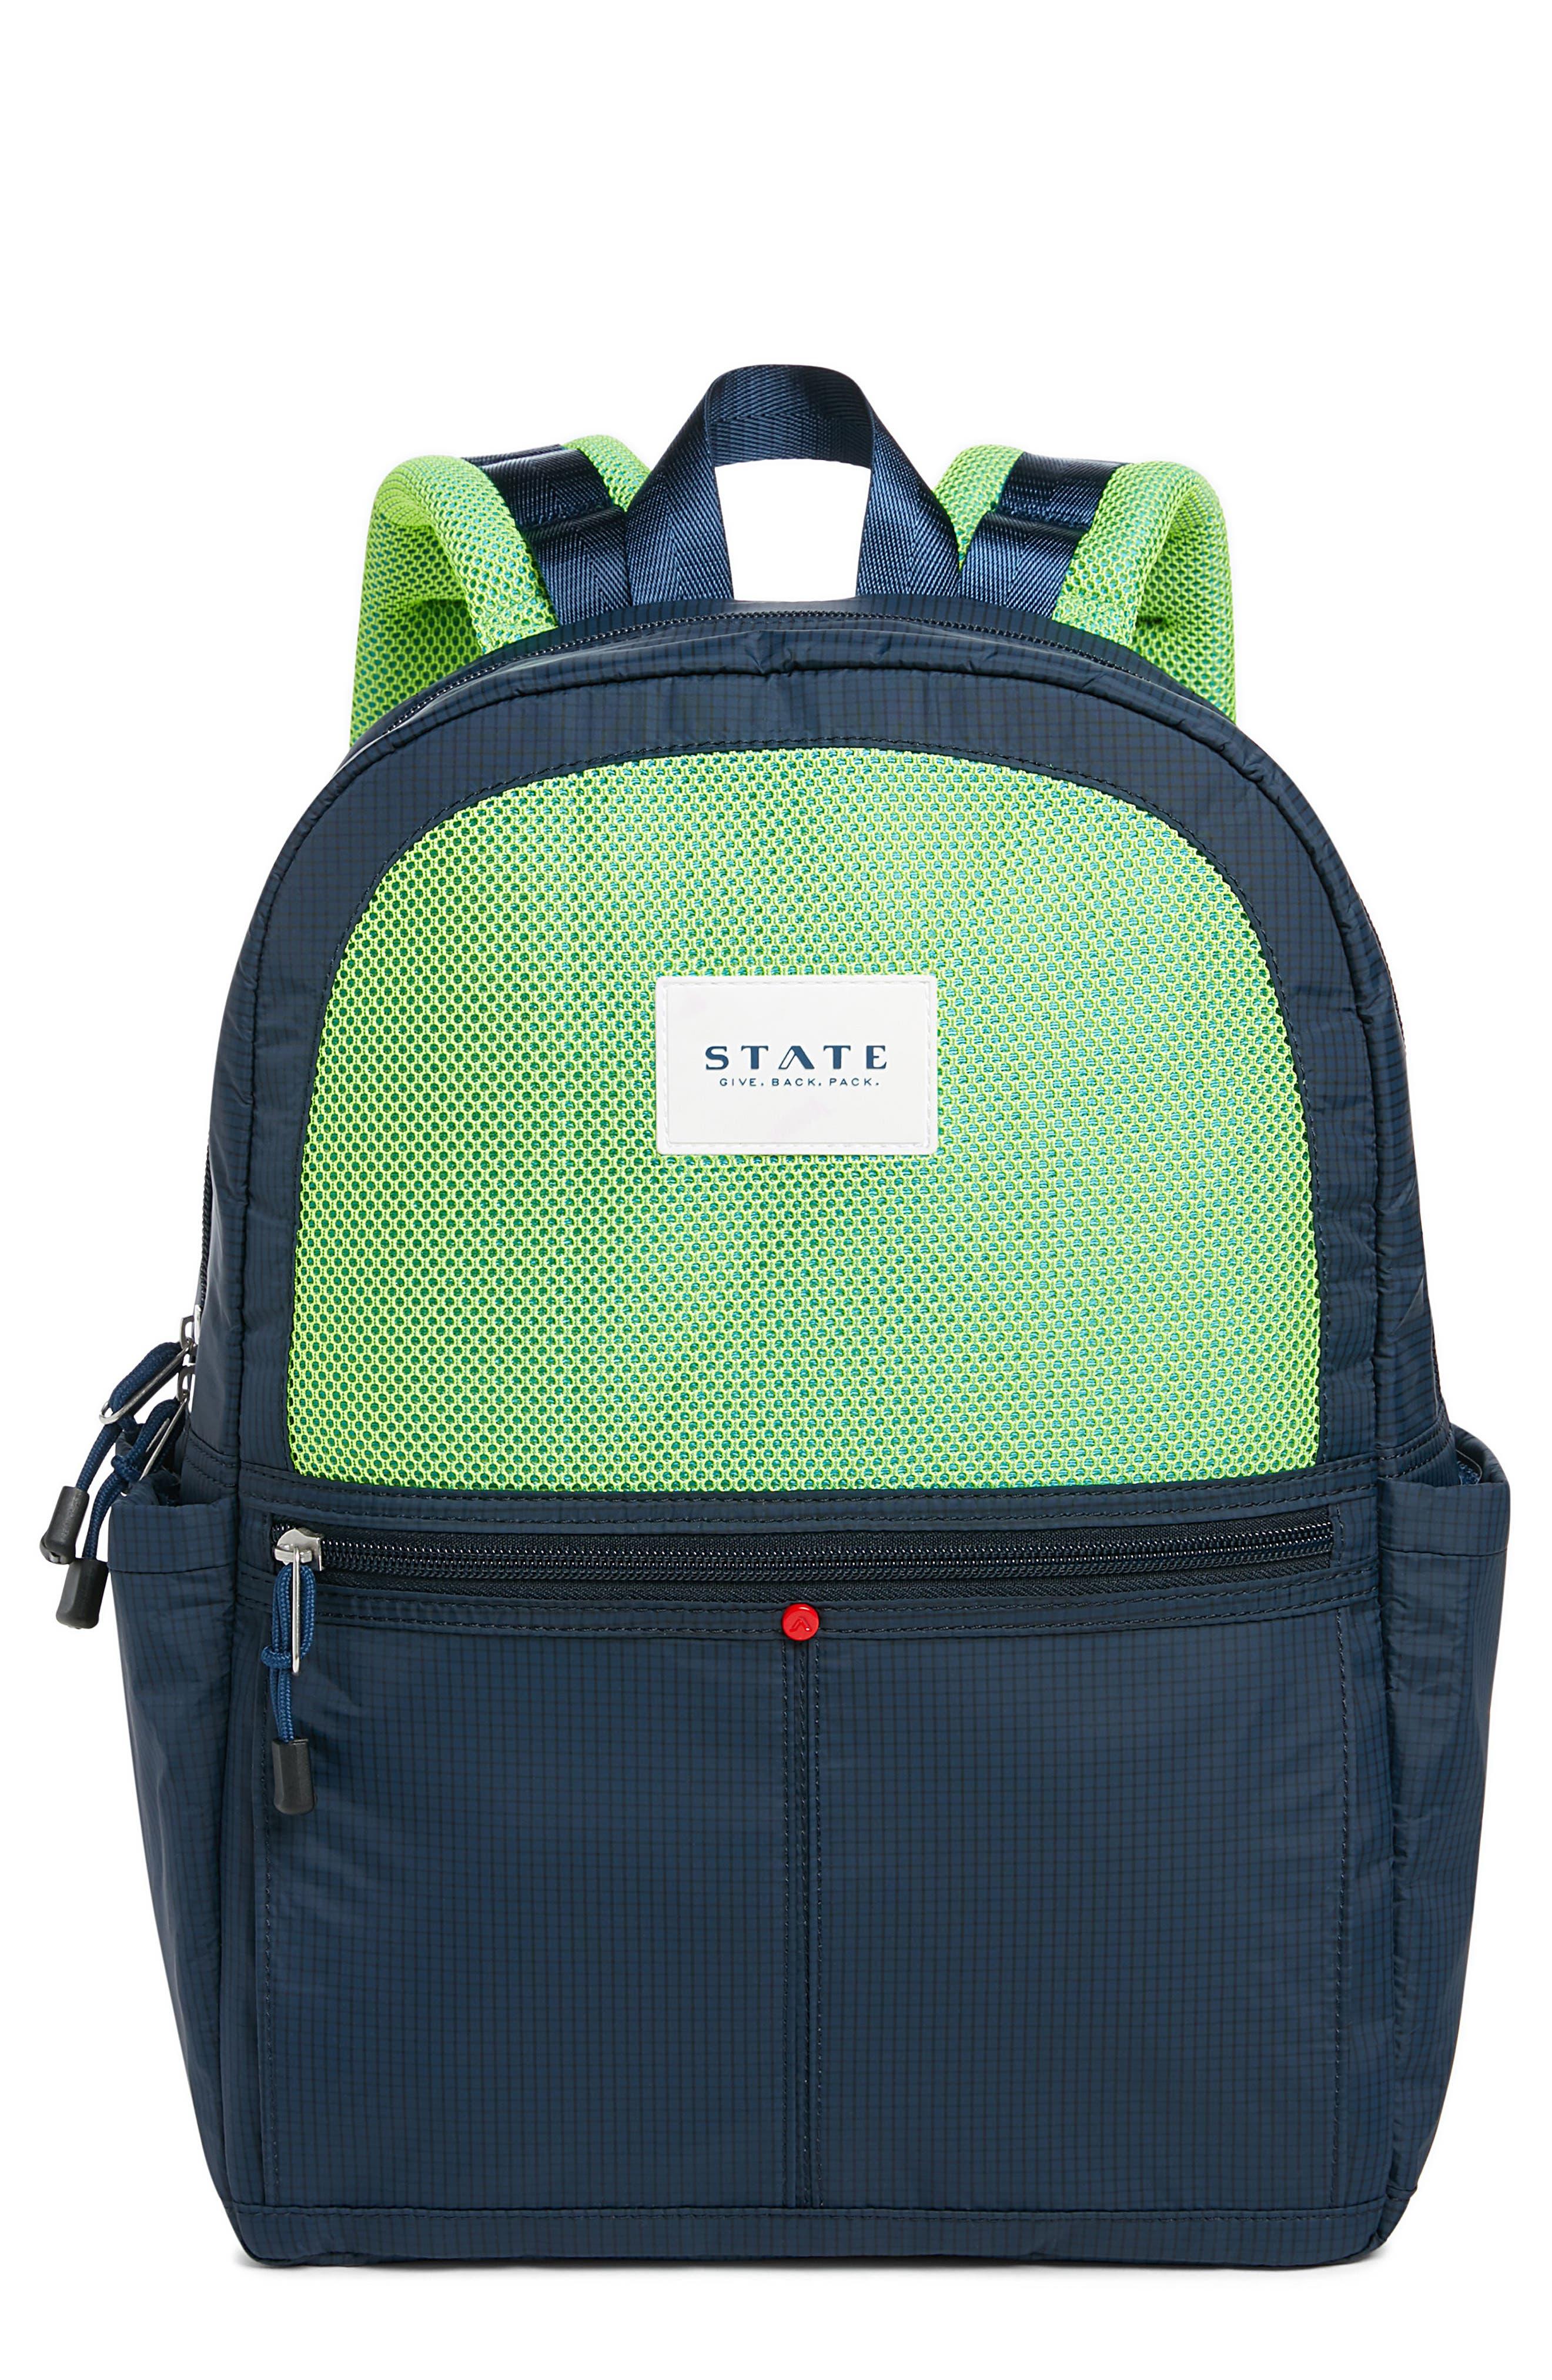 Georgetown Kane Backpack,                         Main,                         color,